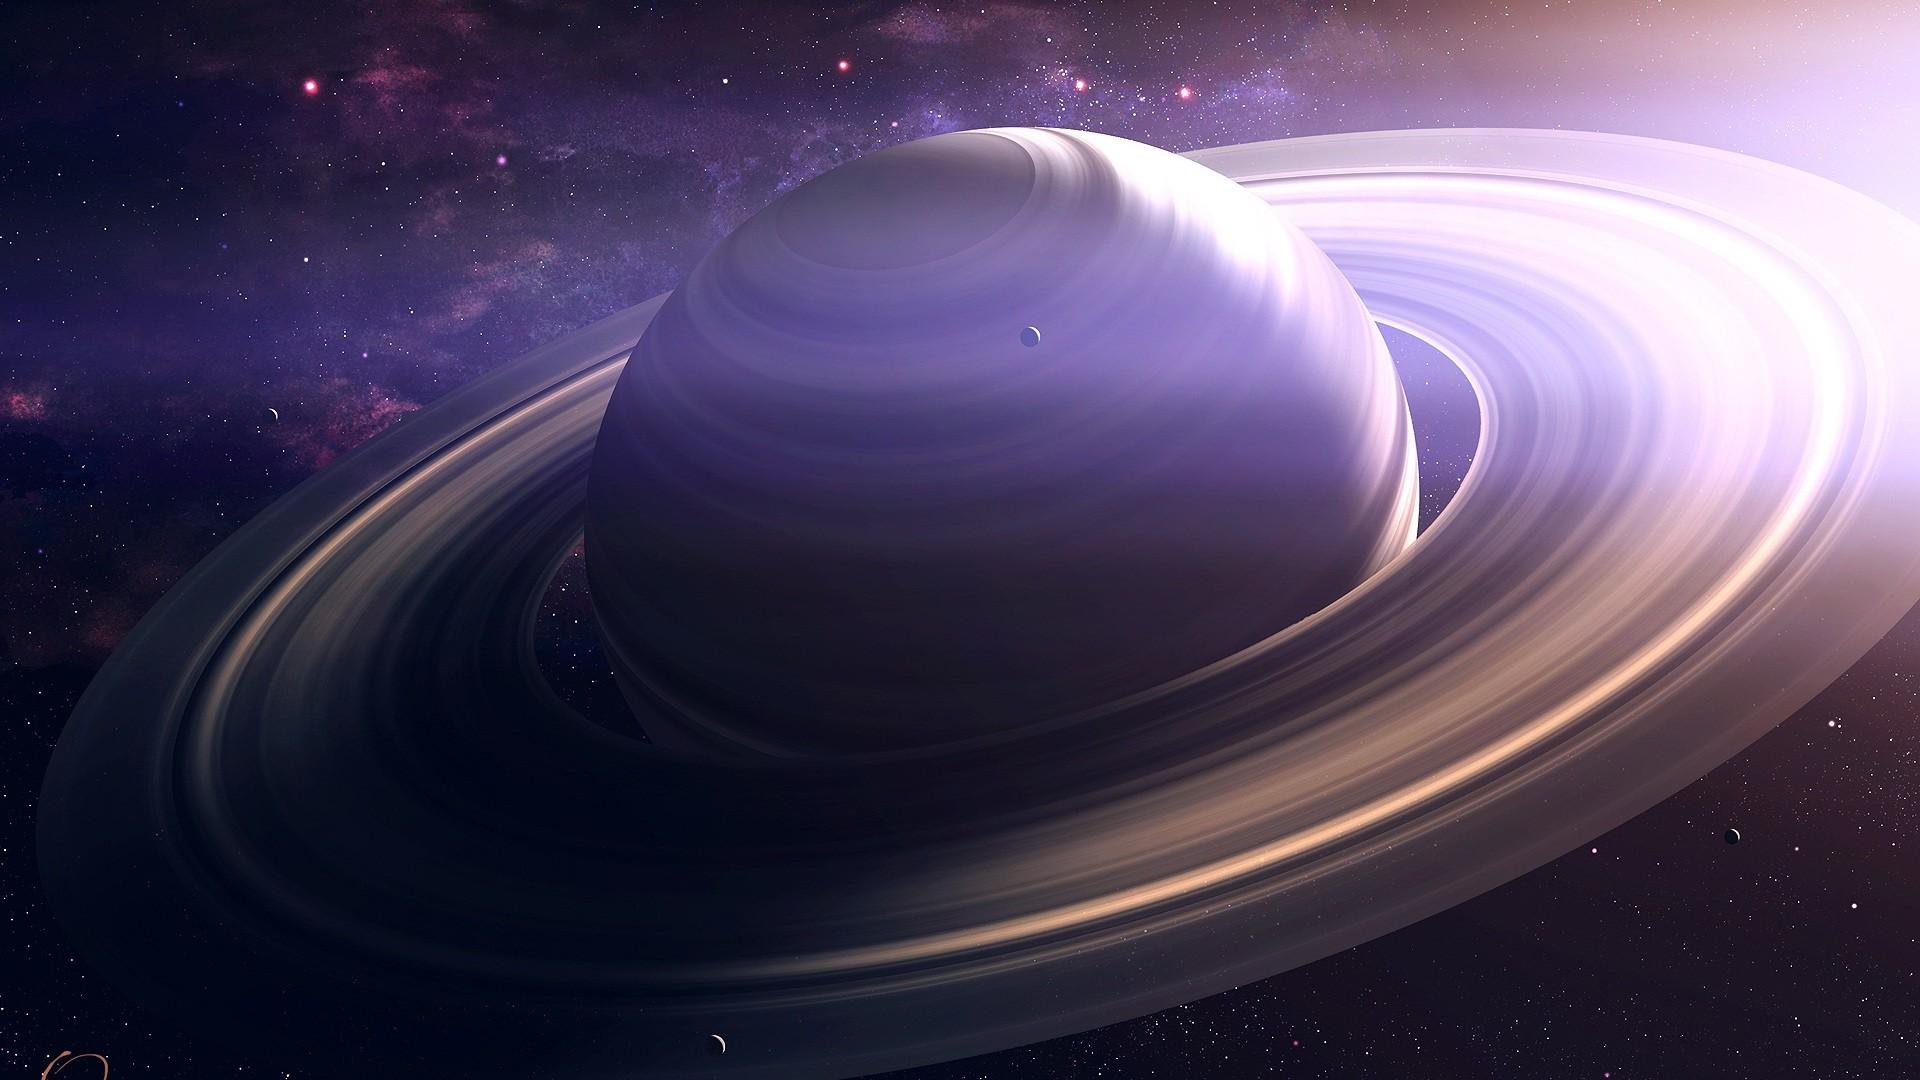 Saturn wallpaper theme